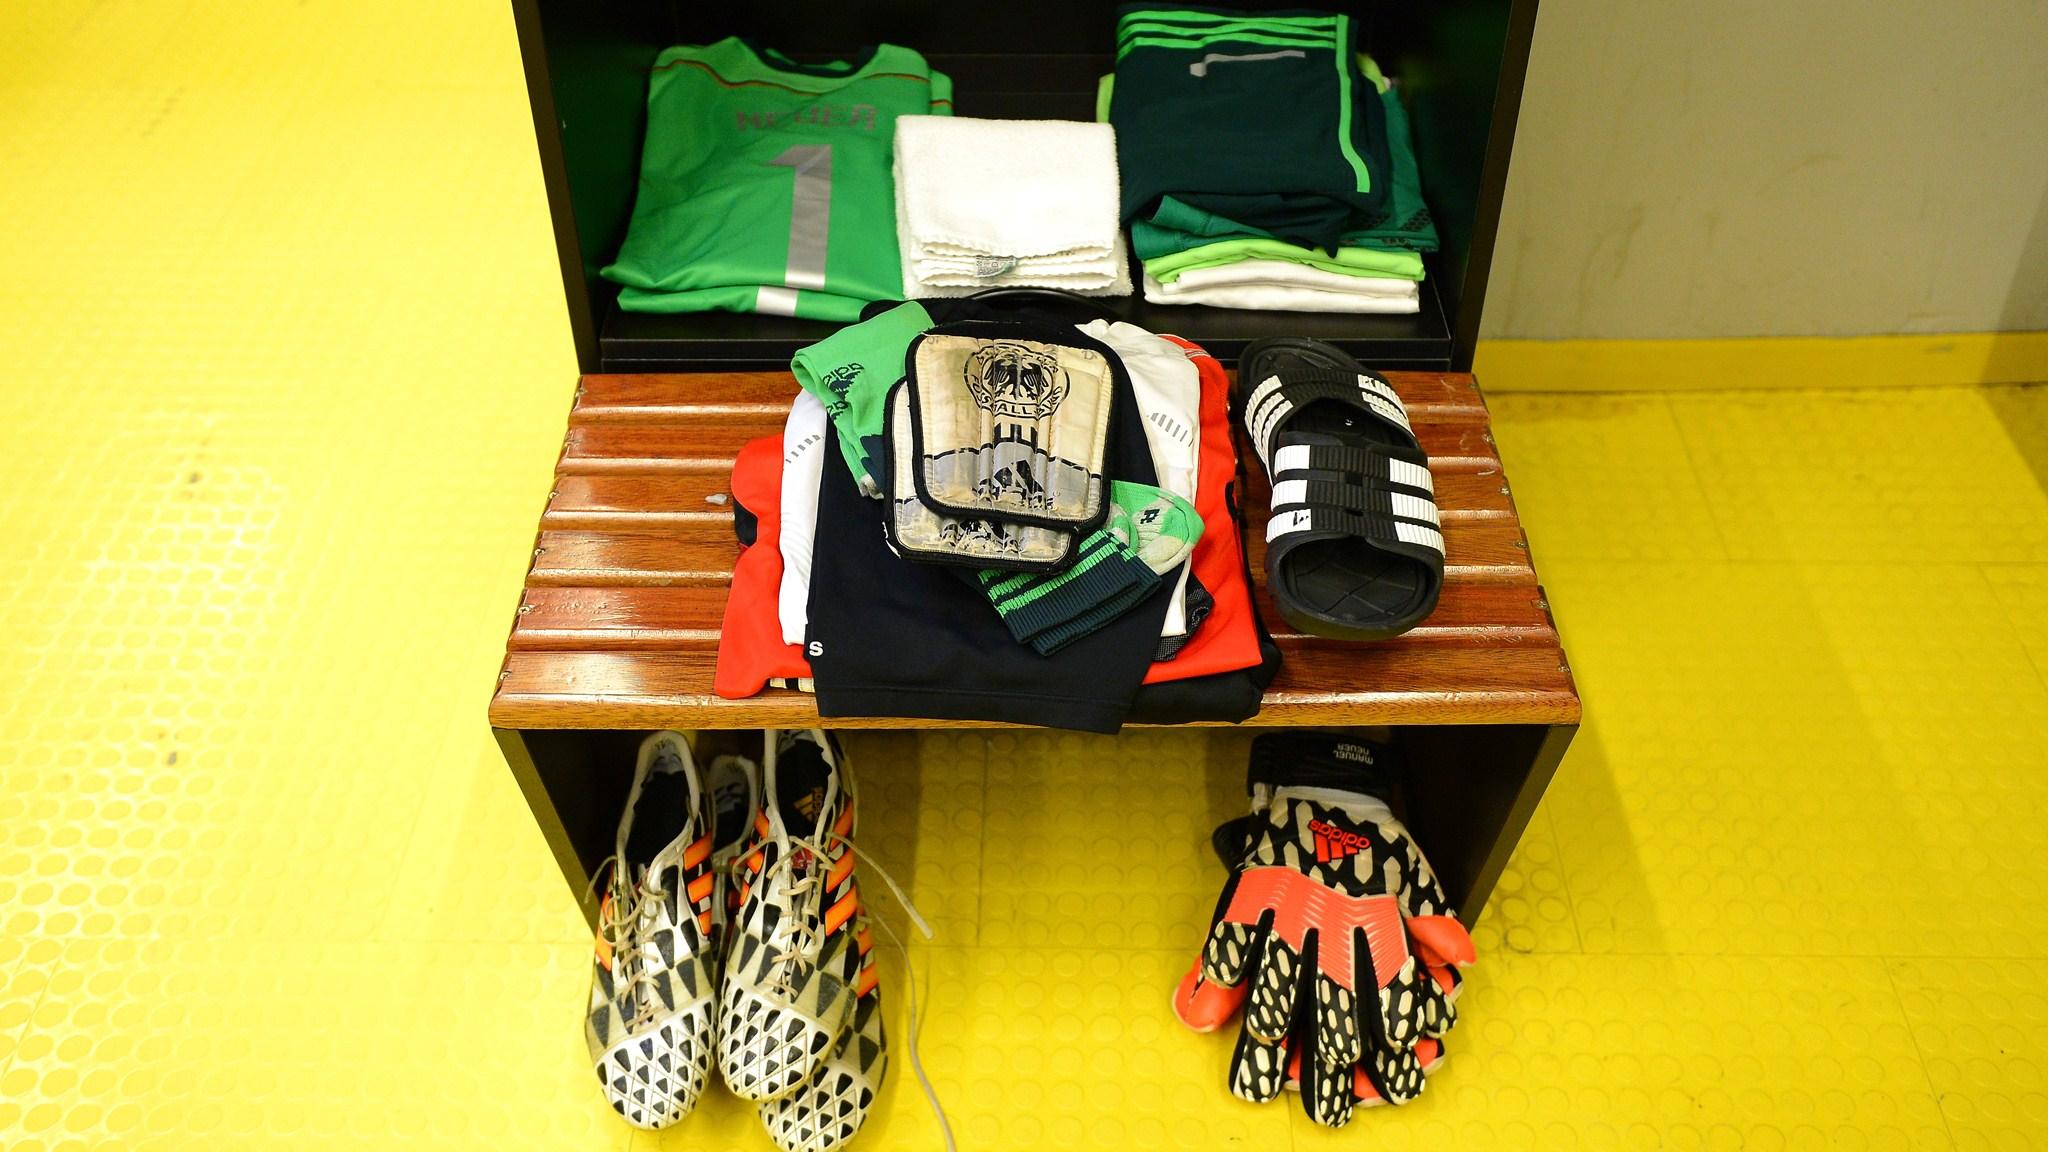 209 - Brazil-Germany [1-7] -- 08 Jul 2014 - 17-00 - kuaza